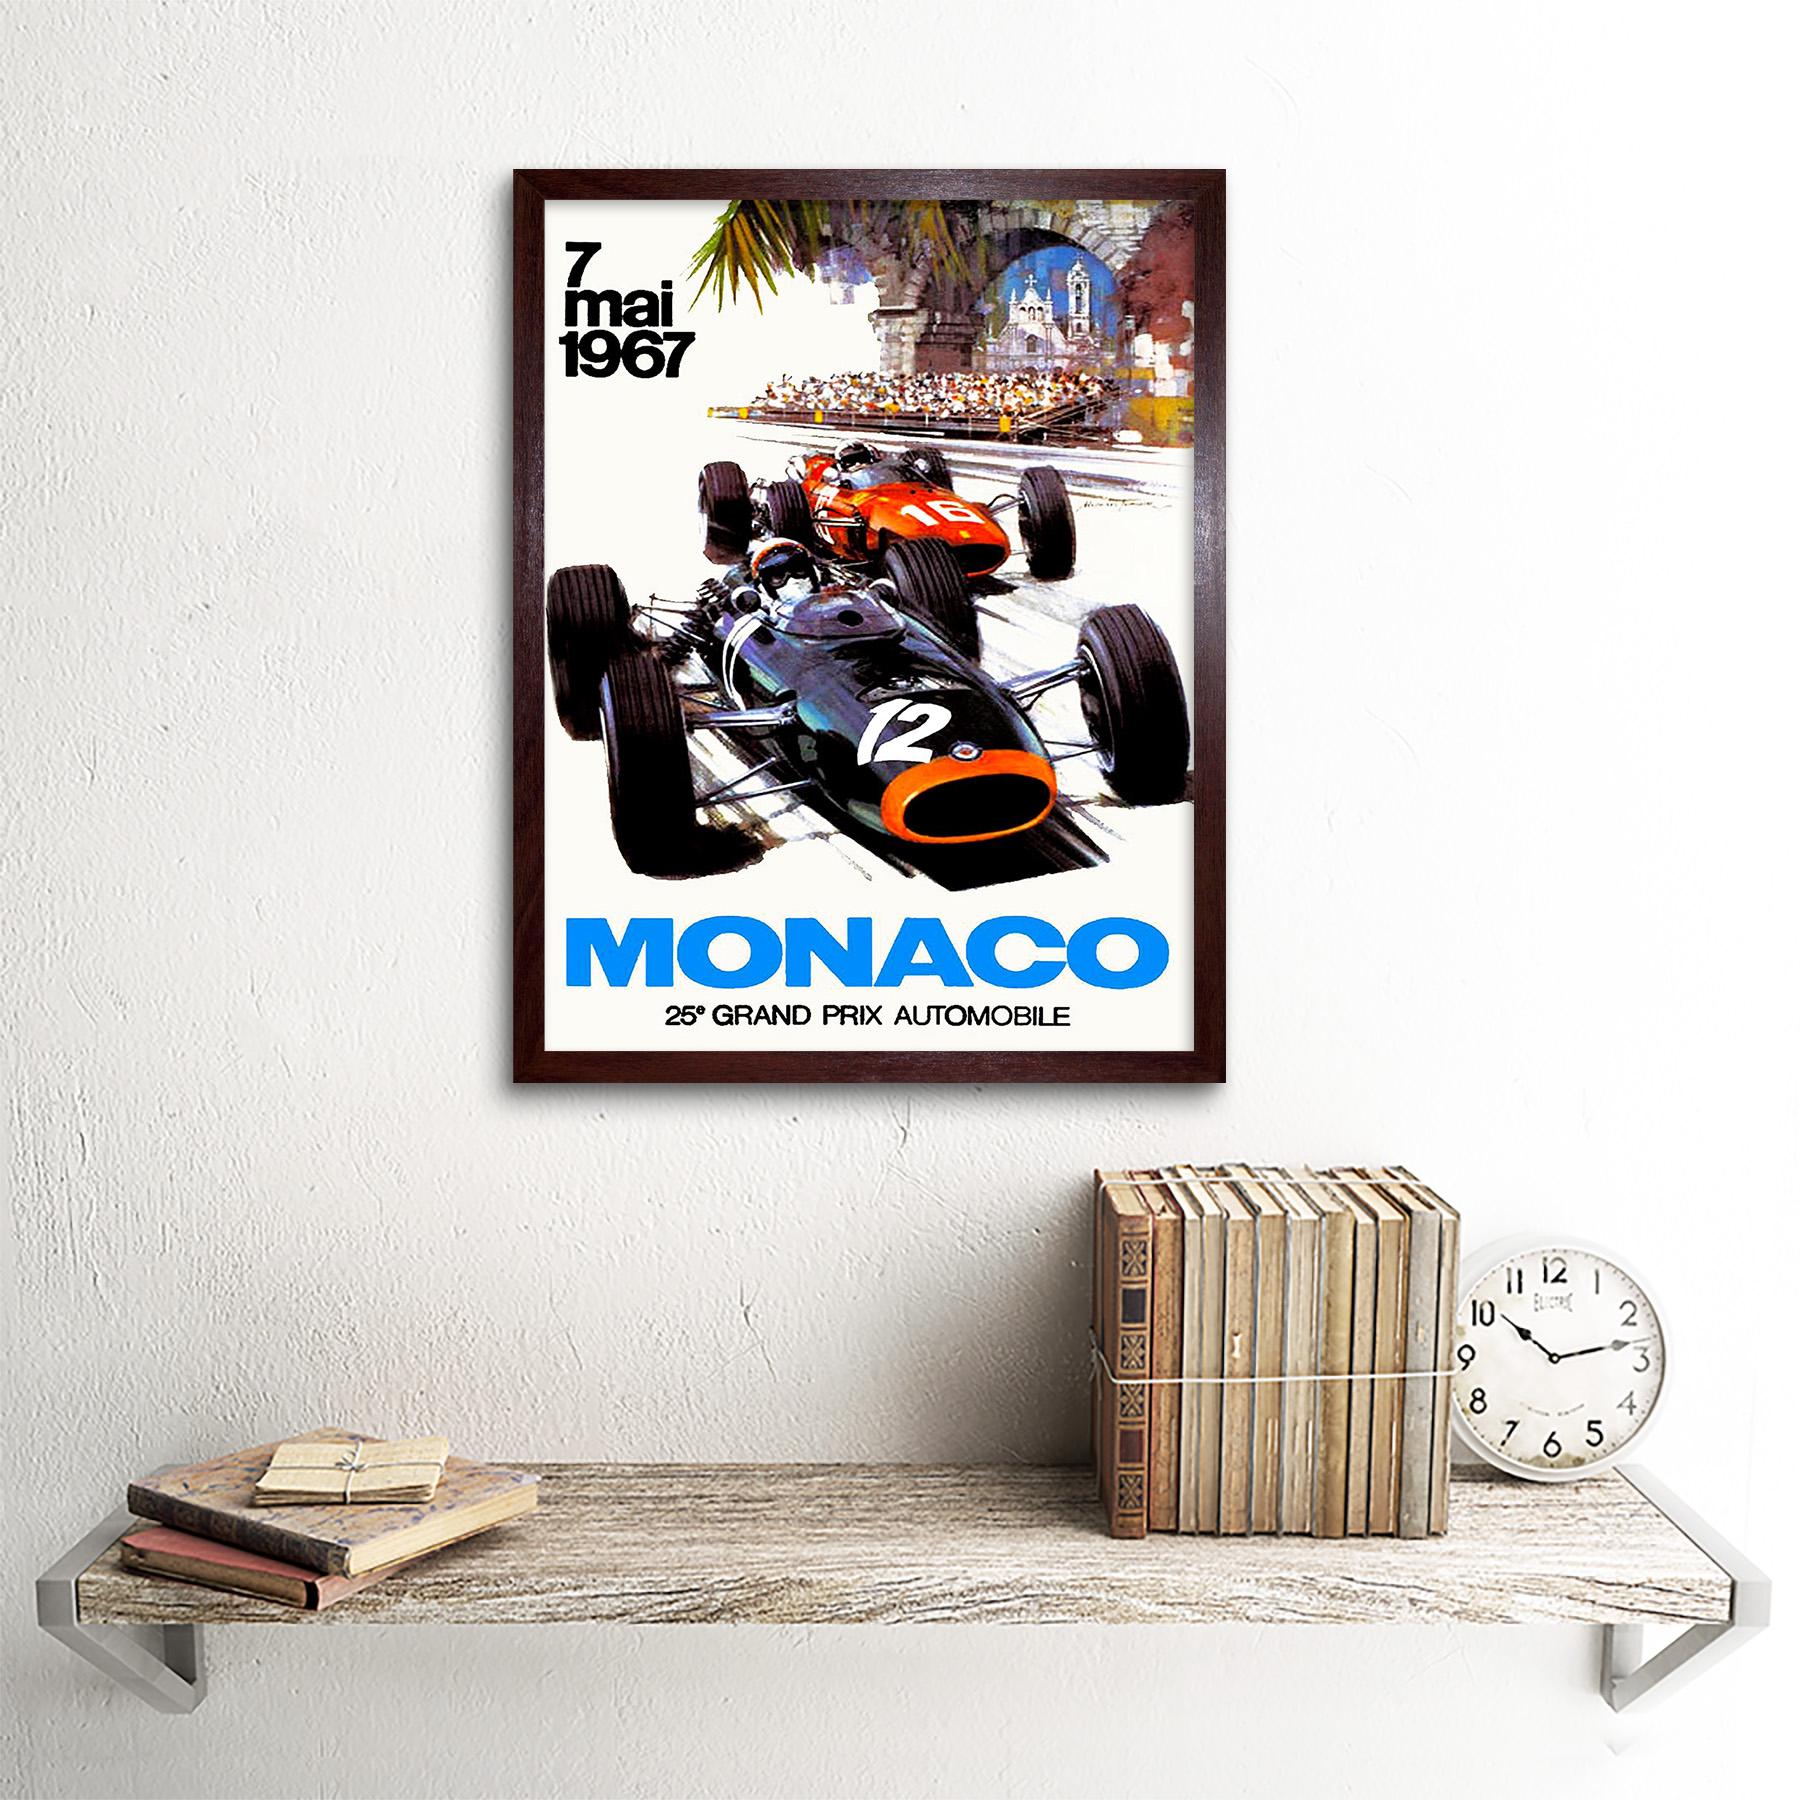 Vintage-Transport-Monaco-25-Grand-Prix-Automobile-1967-Race-12X16-Framed-Print thumbnail 8